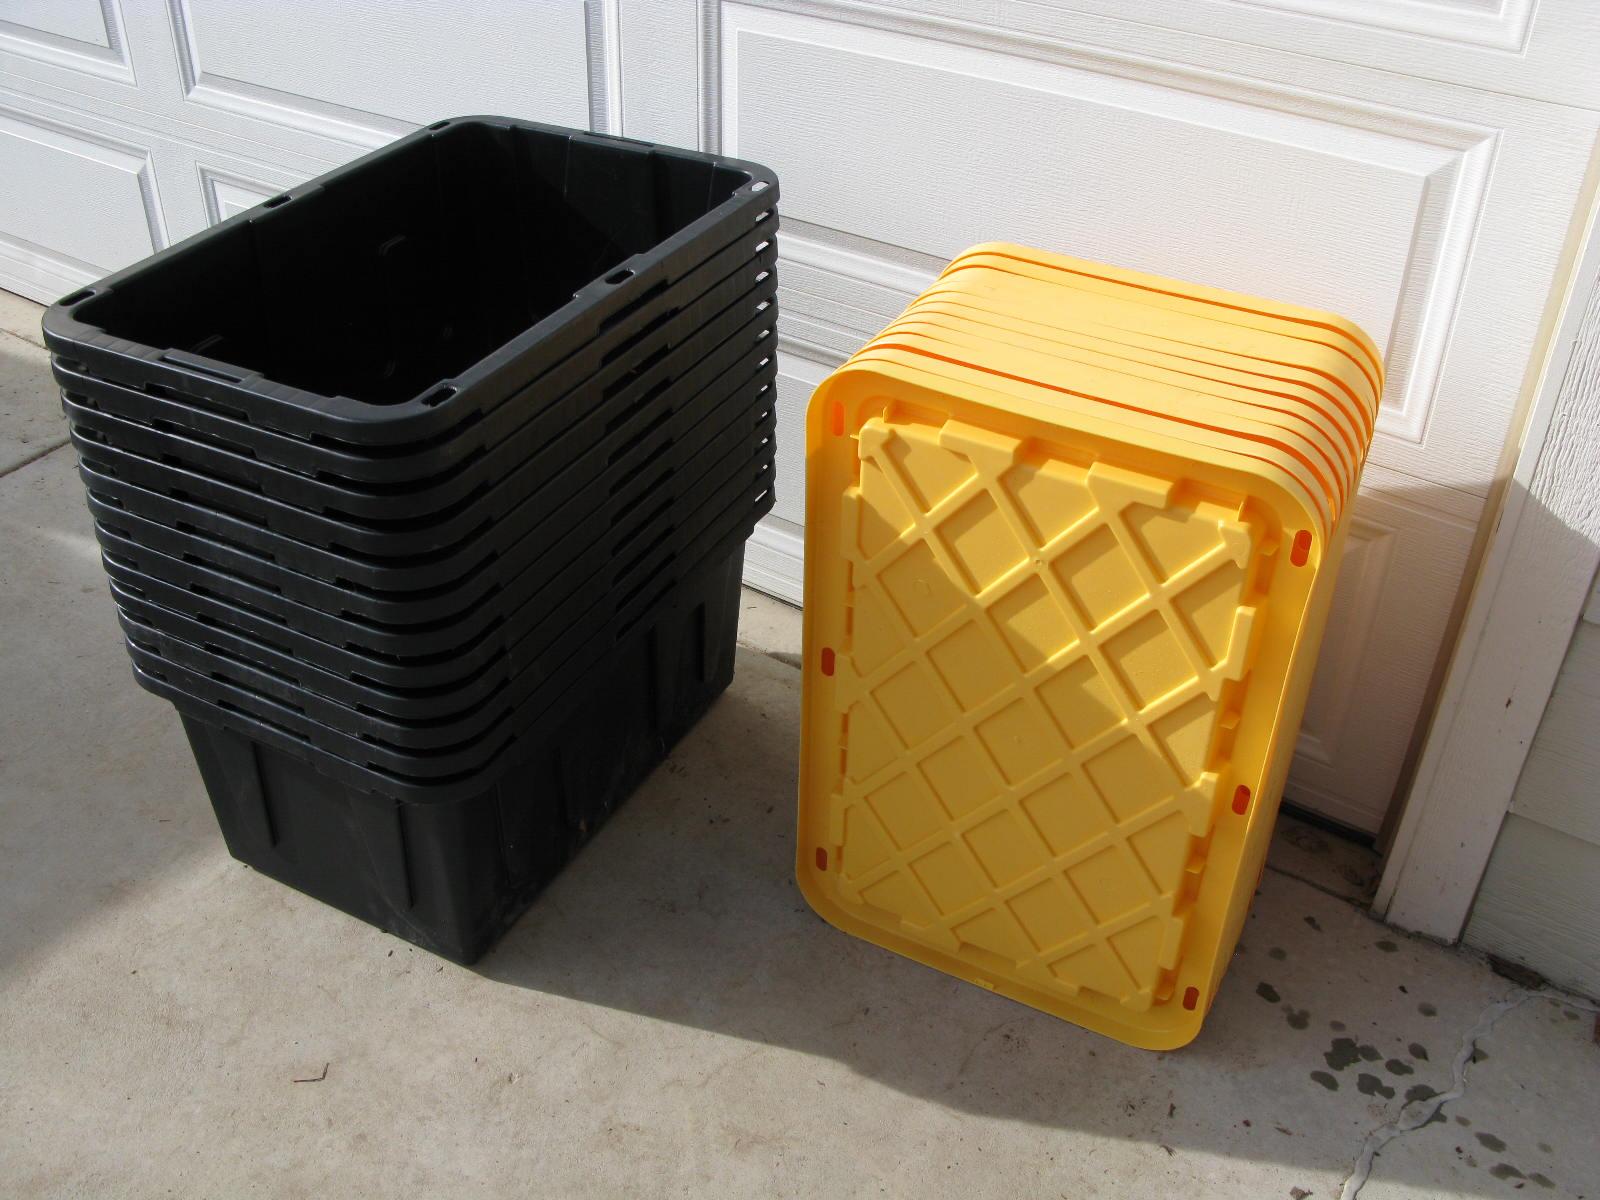 Best Kitchen Gallery: Home Storage of Home Storage Container  on rachelxblog.com